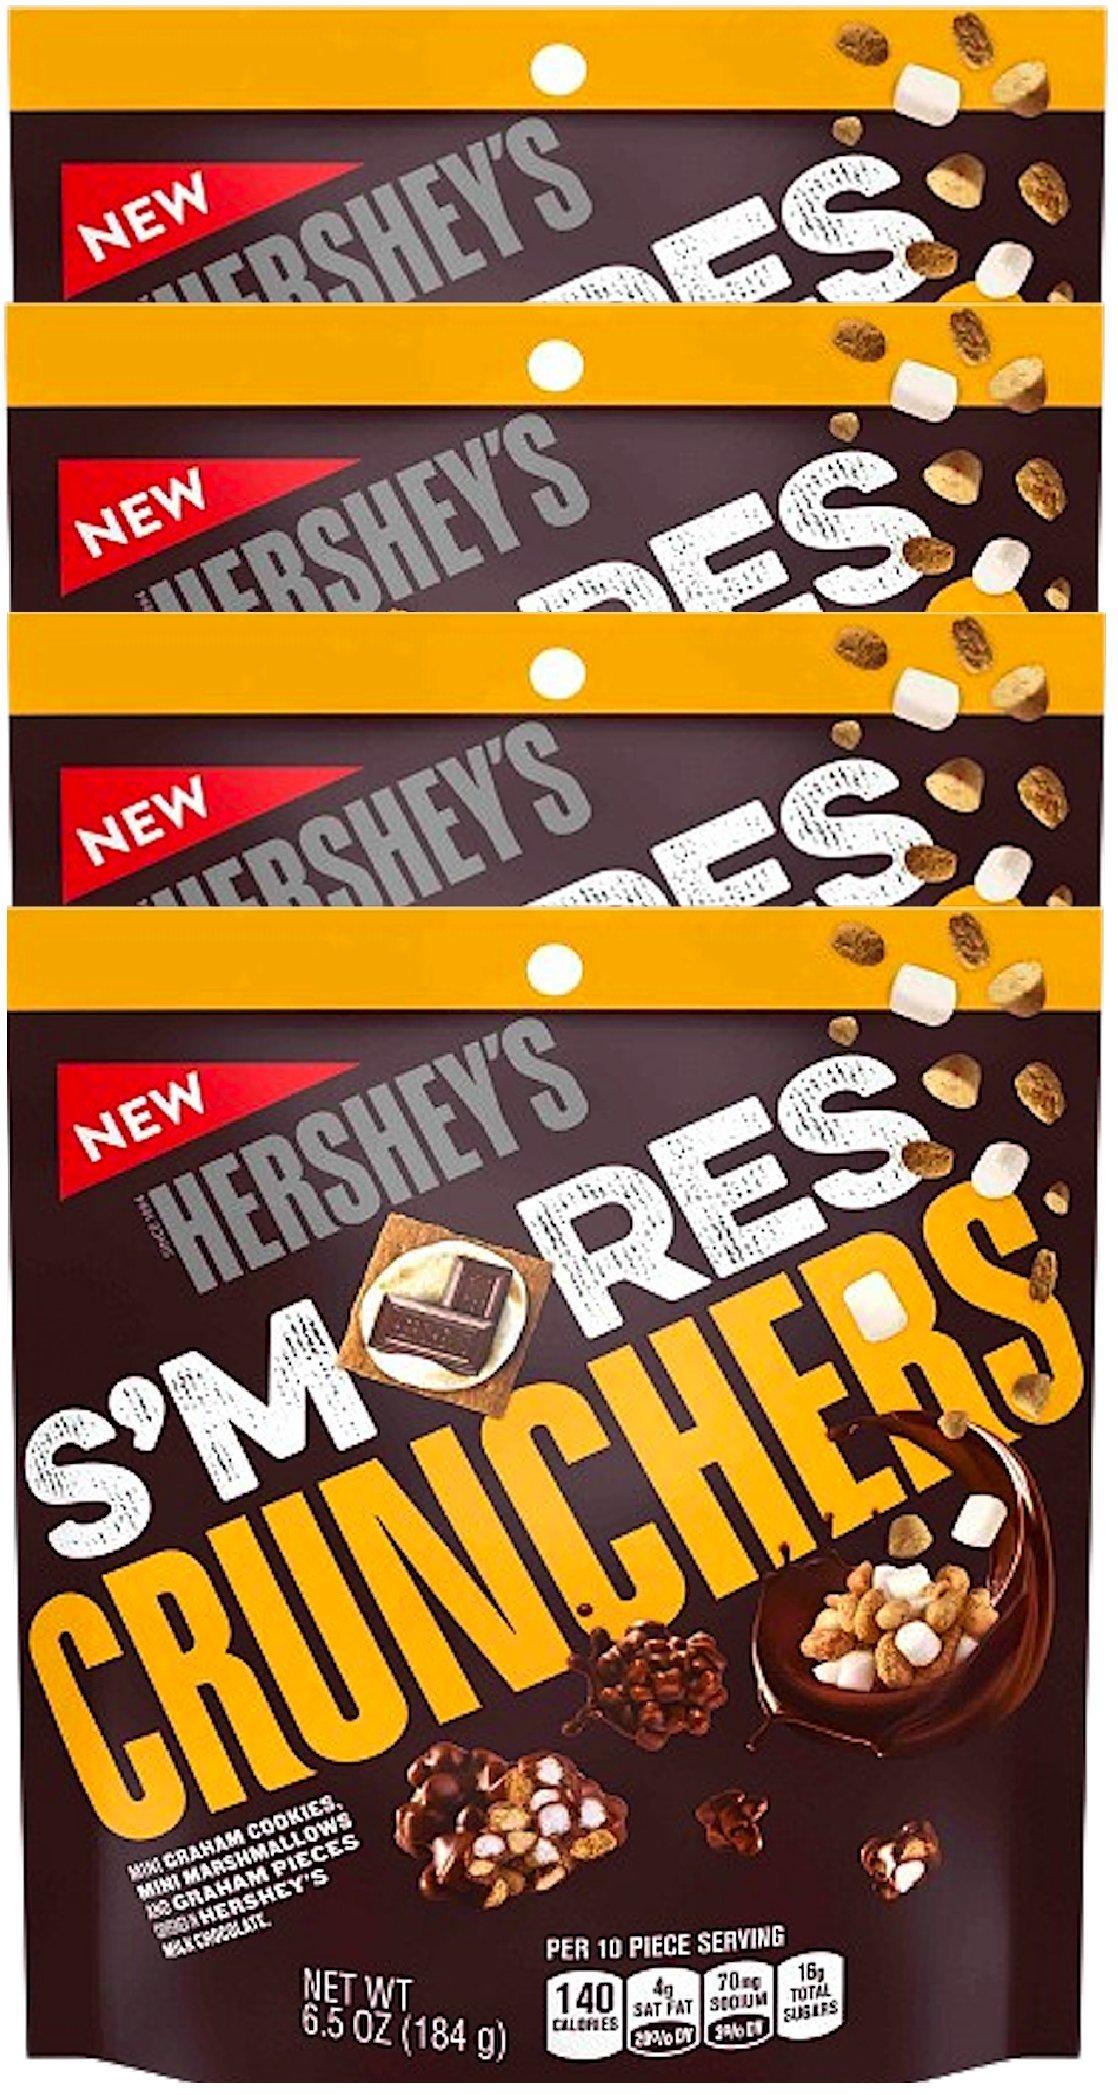 NEW Hershey's S'mores Crunchers Mini Graham Cookies Mini Marshmallows Covered In Hershey's Chocolate Heaven- 6.5oz (4)